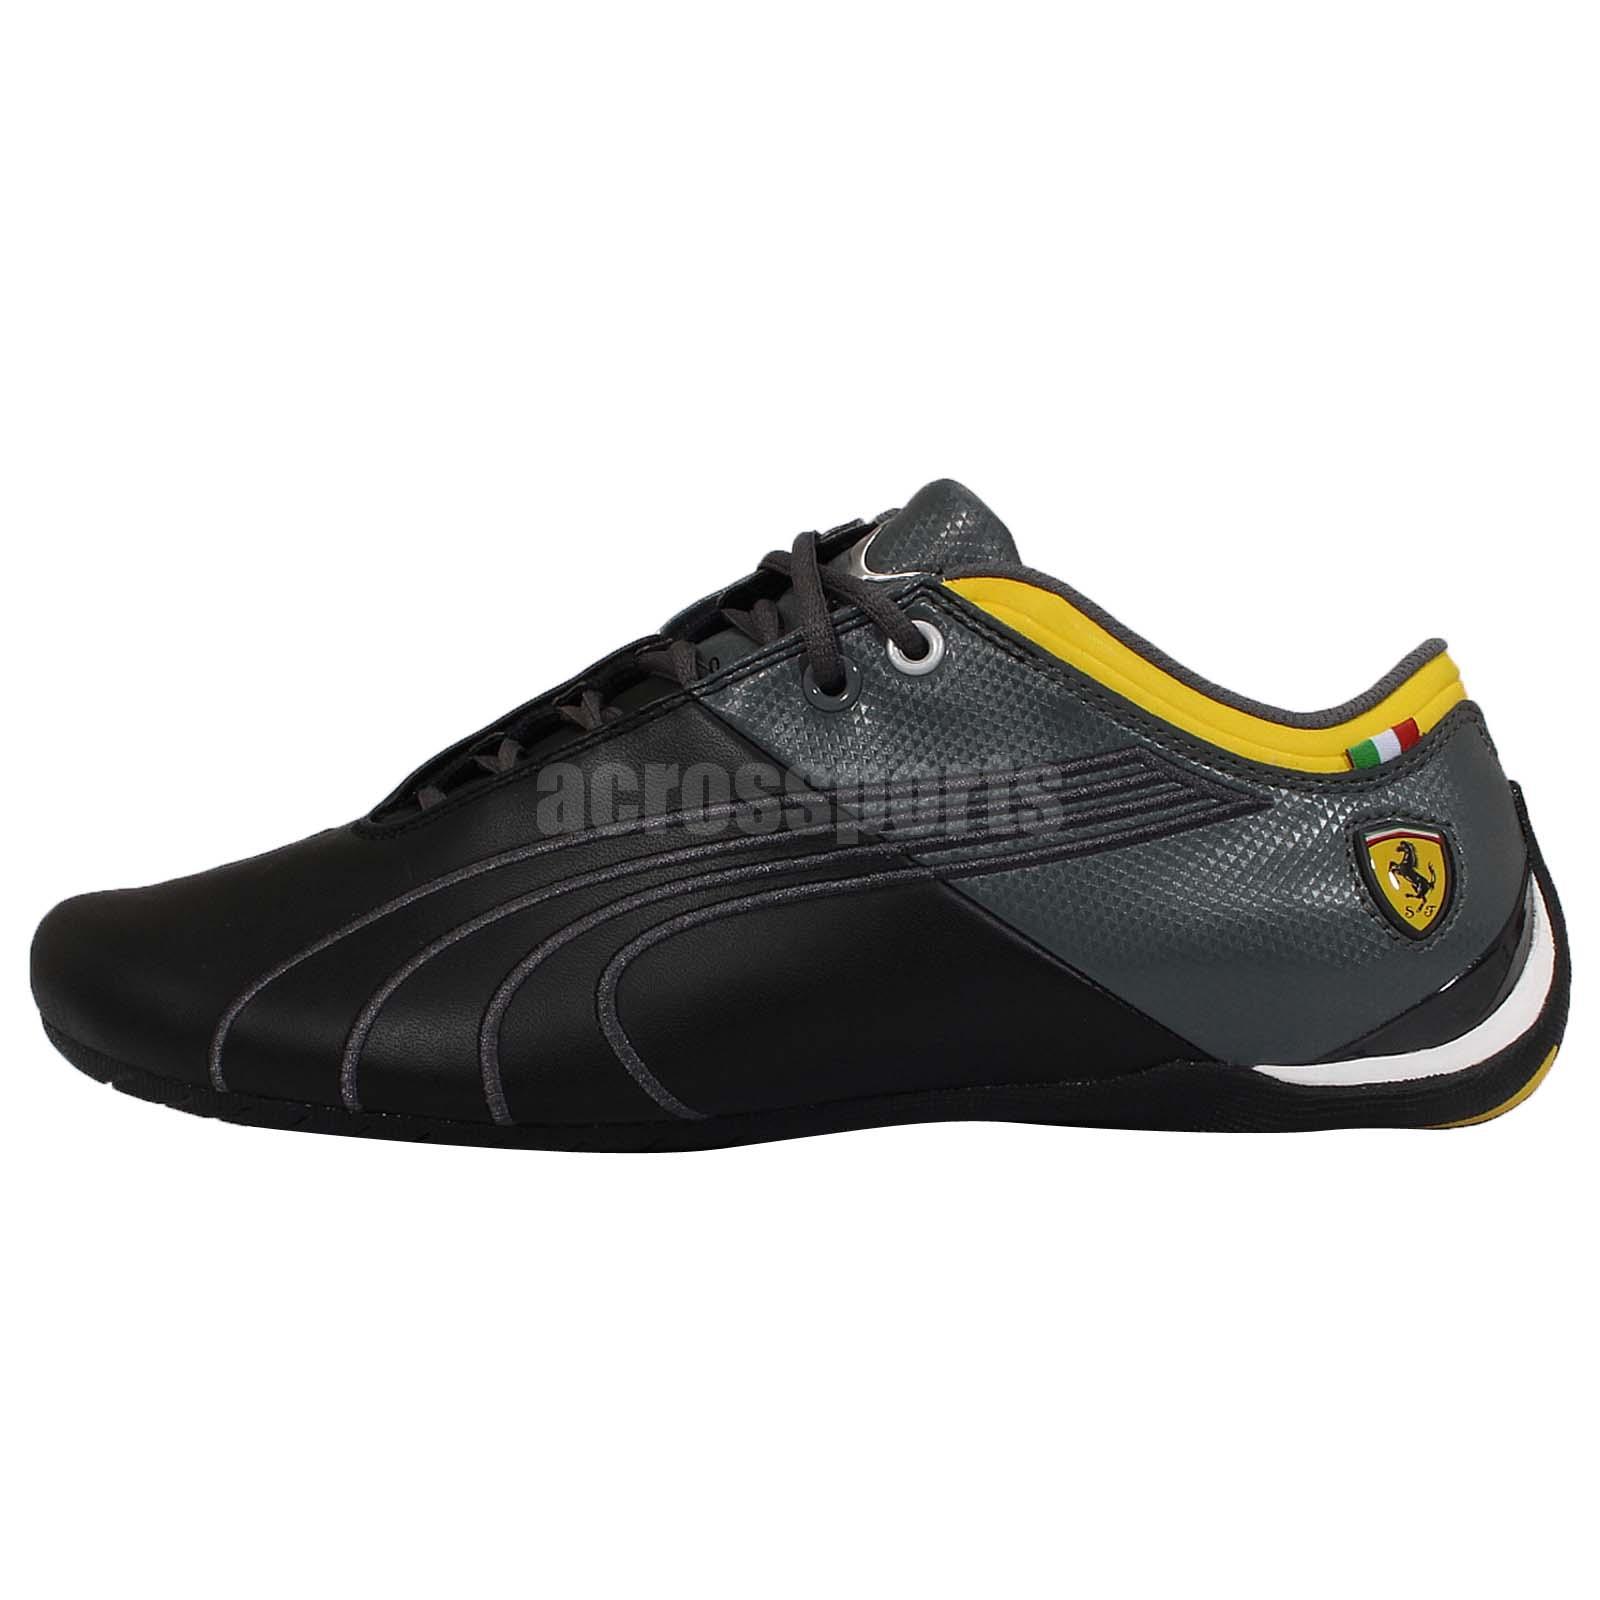 Wwqvkmqx Authentic Puma Ferrari Shoes Black